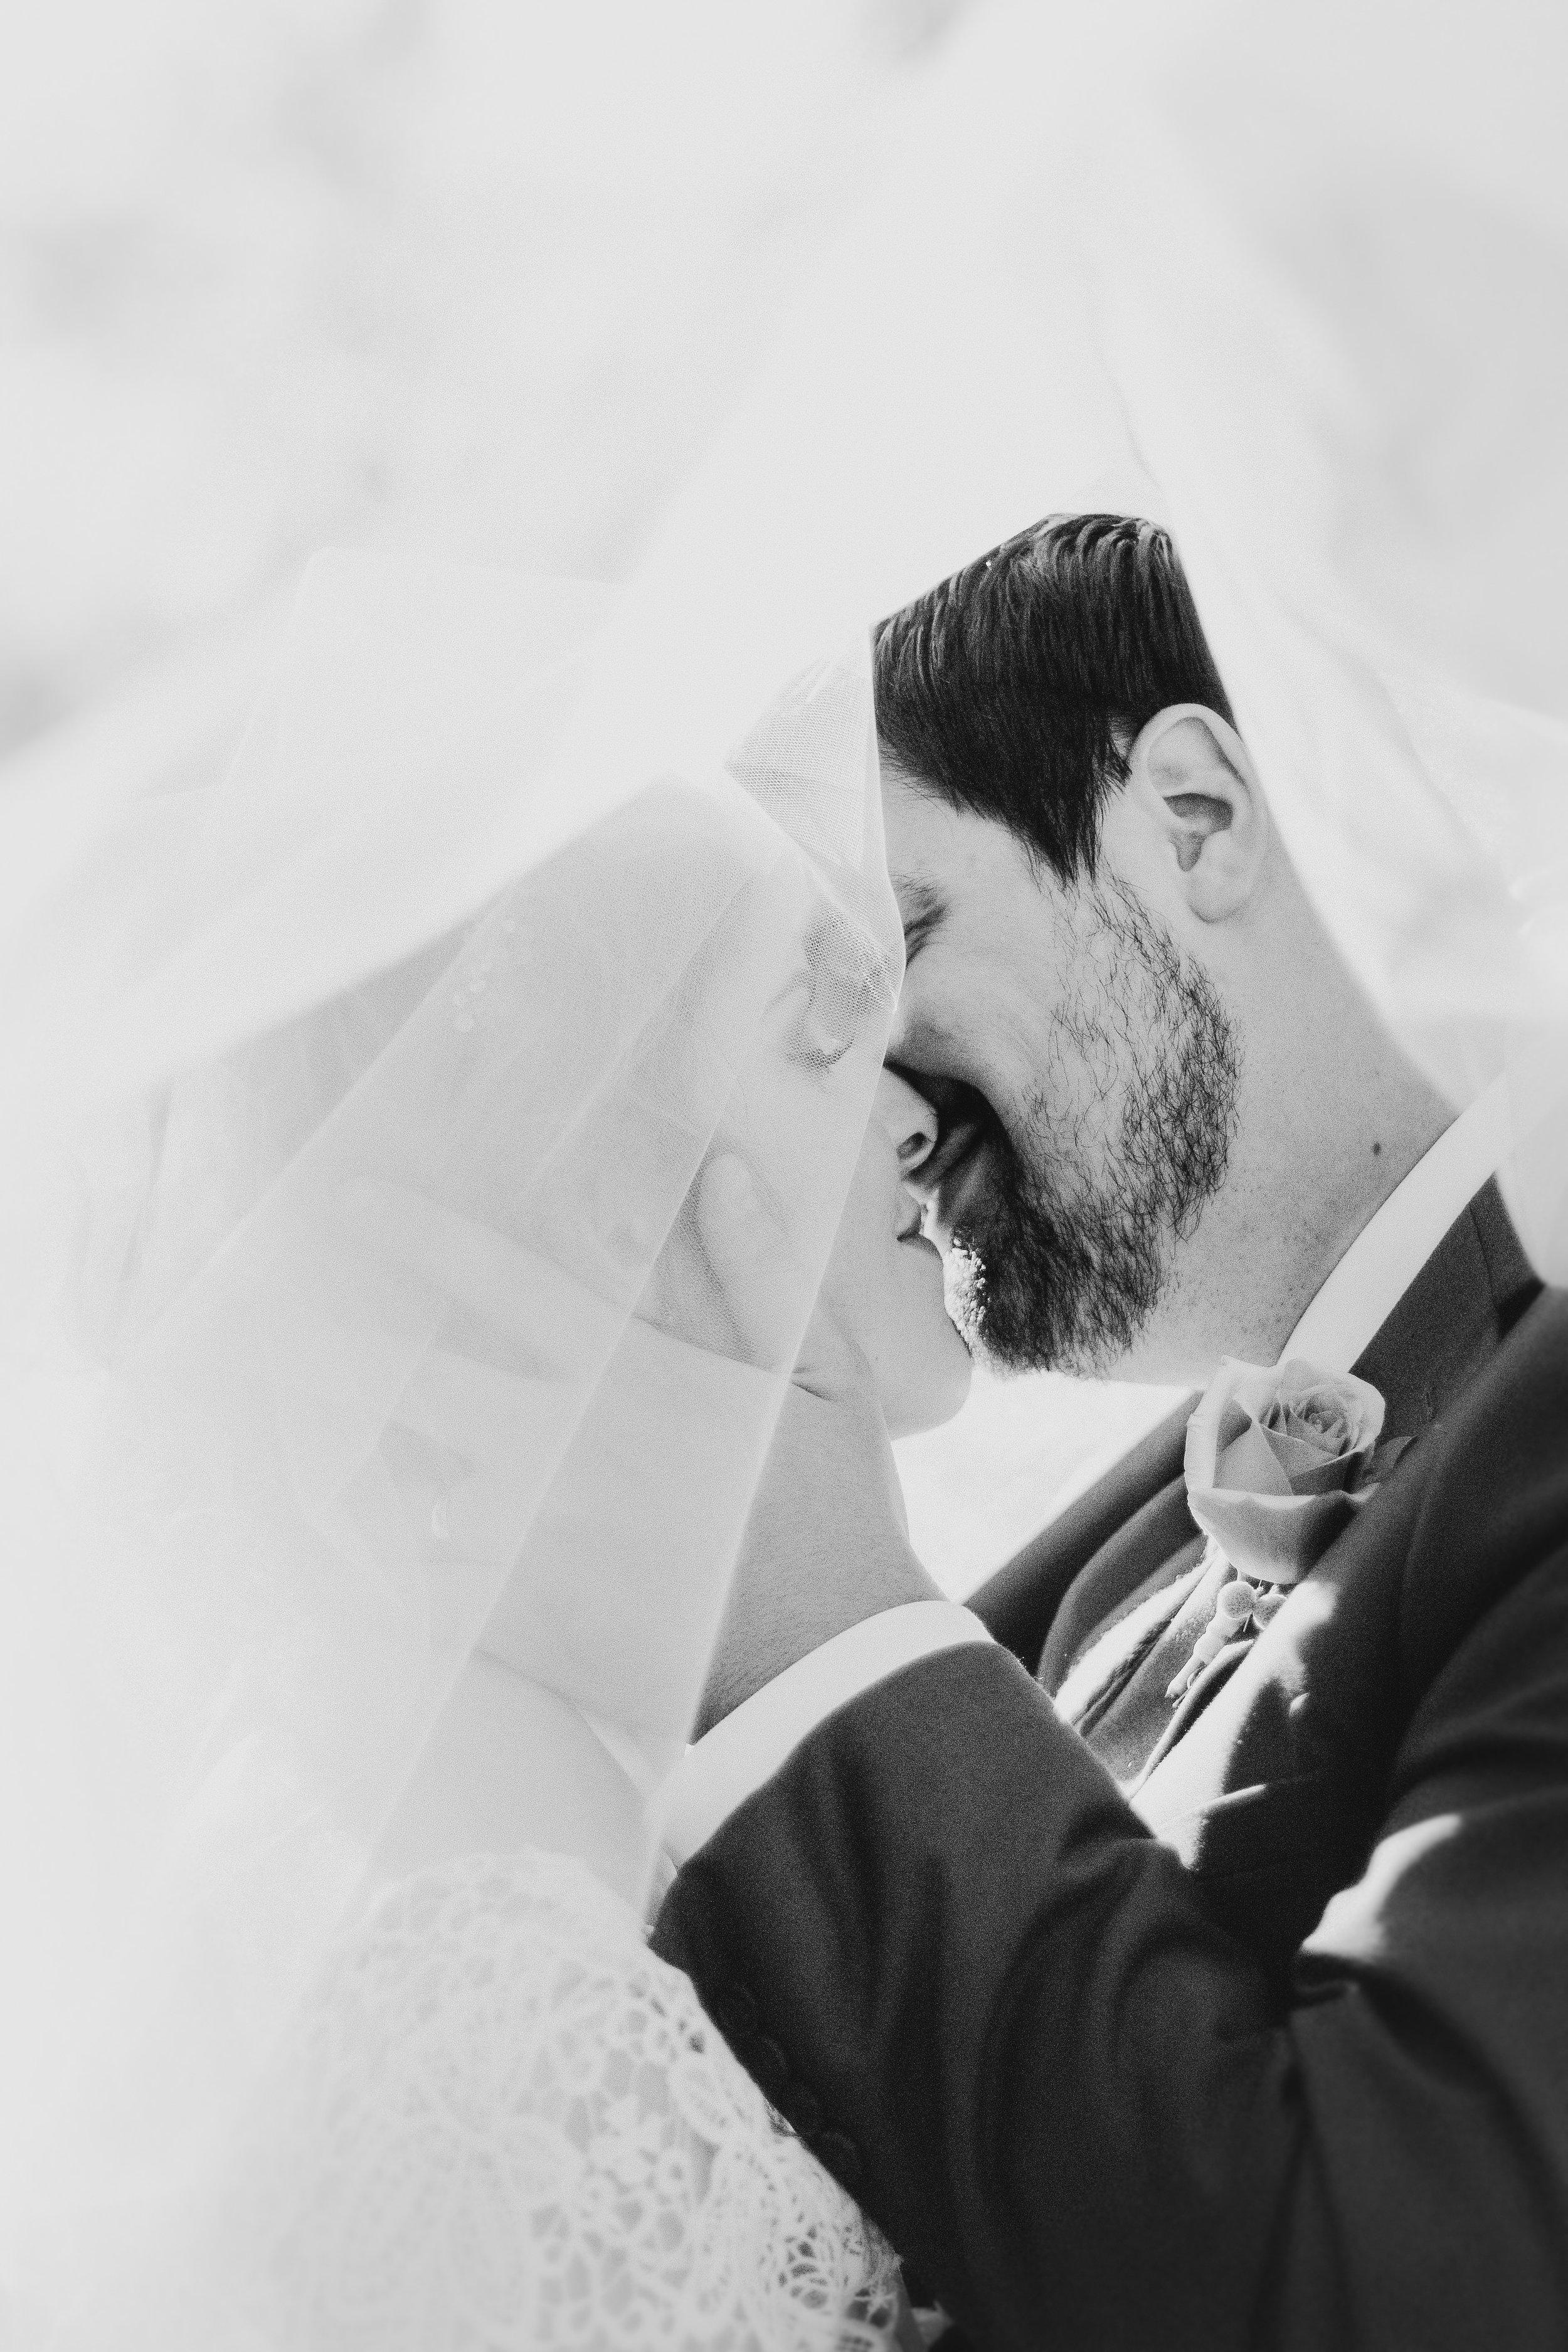 South Florida Wedding Planner | Delray Beach Wedding Planner | Palm Beach Wedding Planner | Palm Beach Gardens Wedding Planner | Jupiter Wedding Planner | South Florida Destination Wedding Planner | South Florida Wedding Planner | Delray Beach Wedding Planner | Miami Wedding Planner | Long Island Wedding Planner | Garden City Wedding Planner | LI Wedding Planner | Elmont Wedding Planner | NYC Wedding Planner